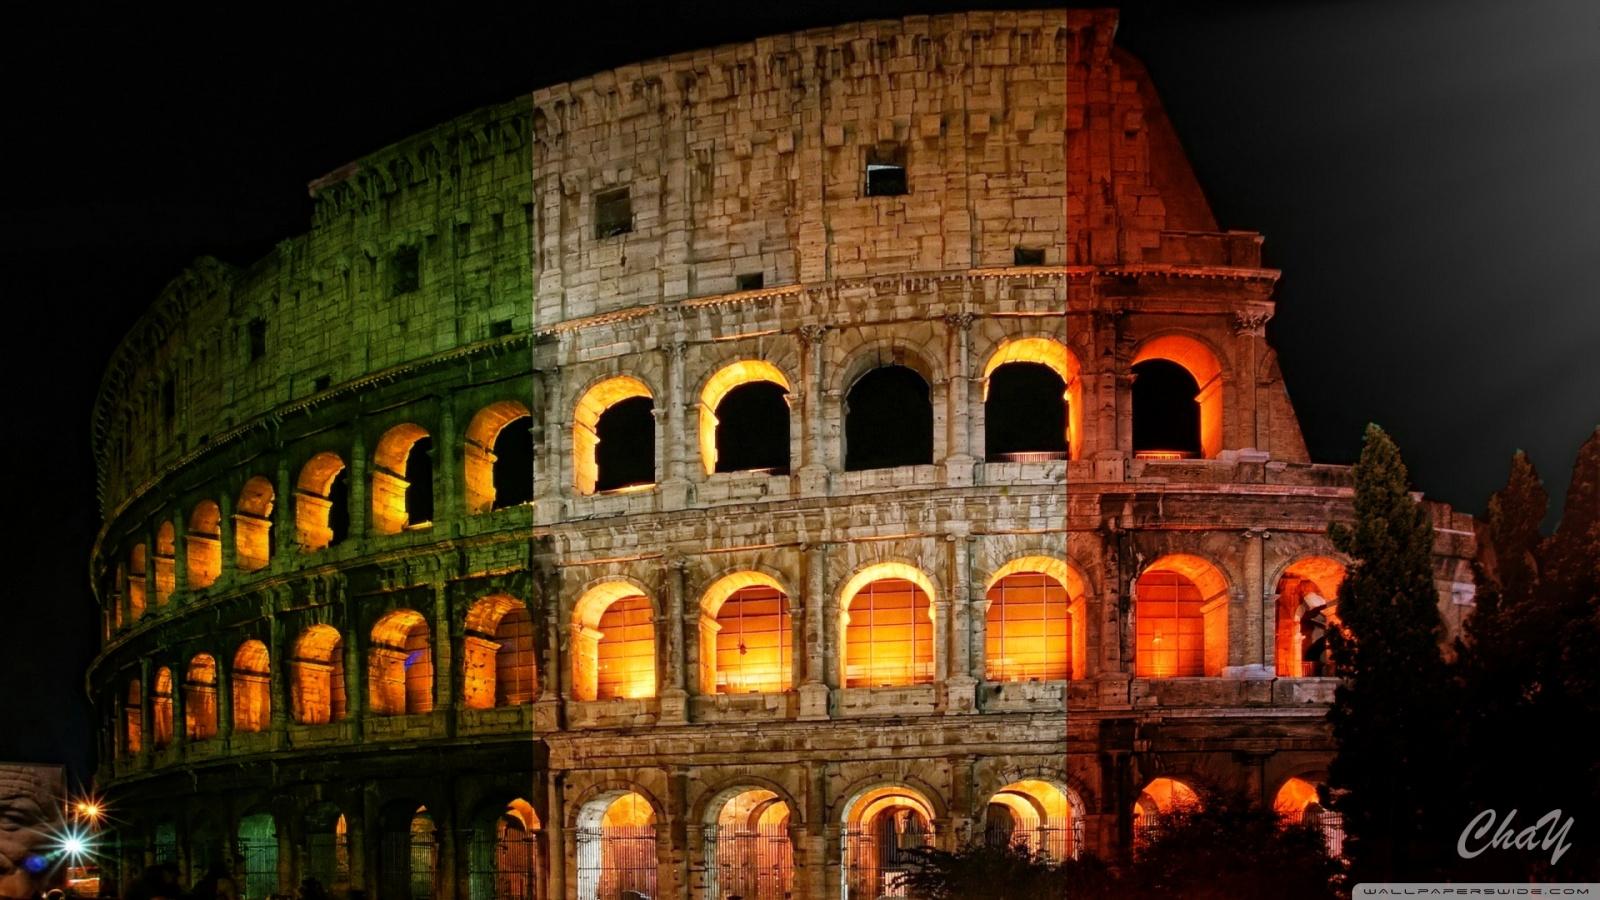 rim jesenja putovanja evropske metropole gradovi